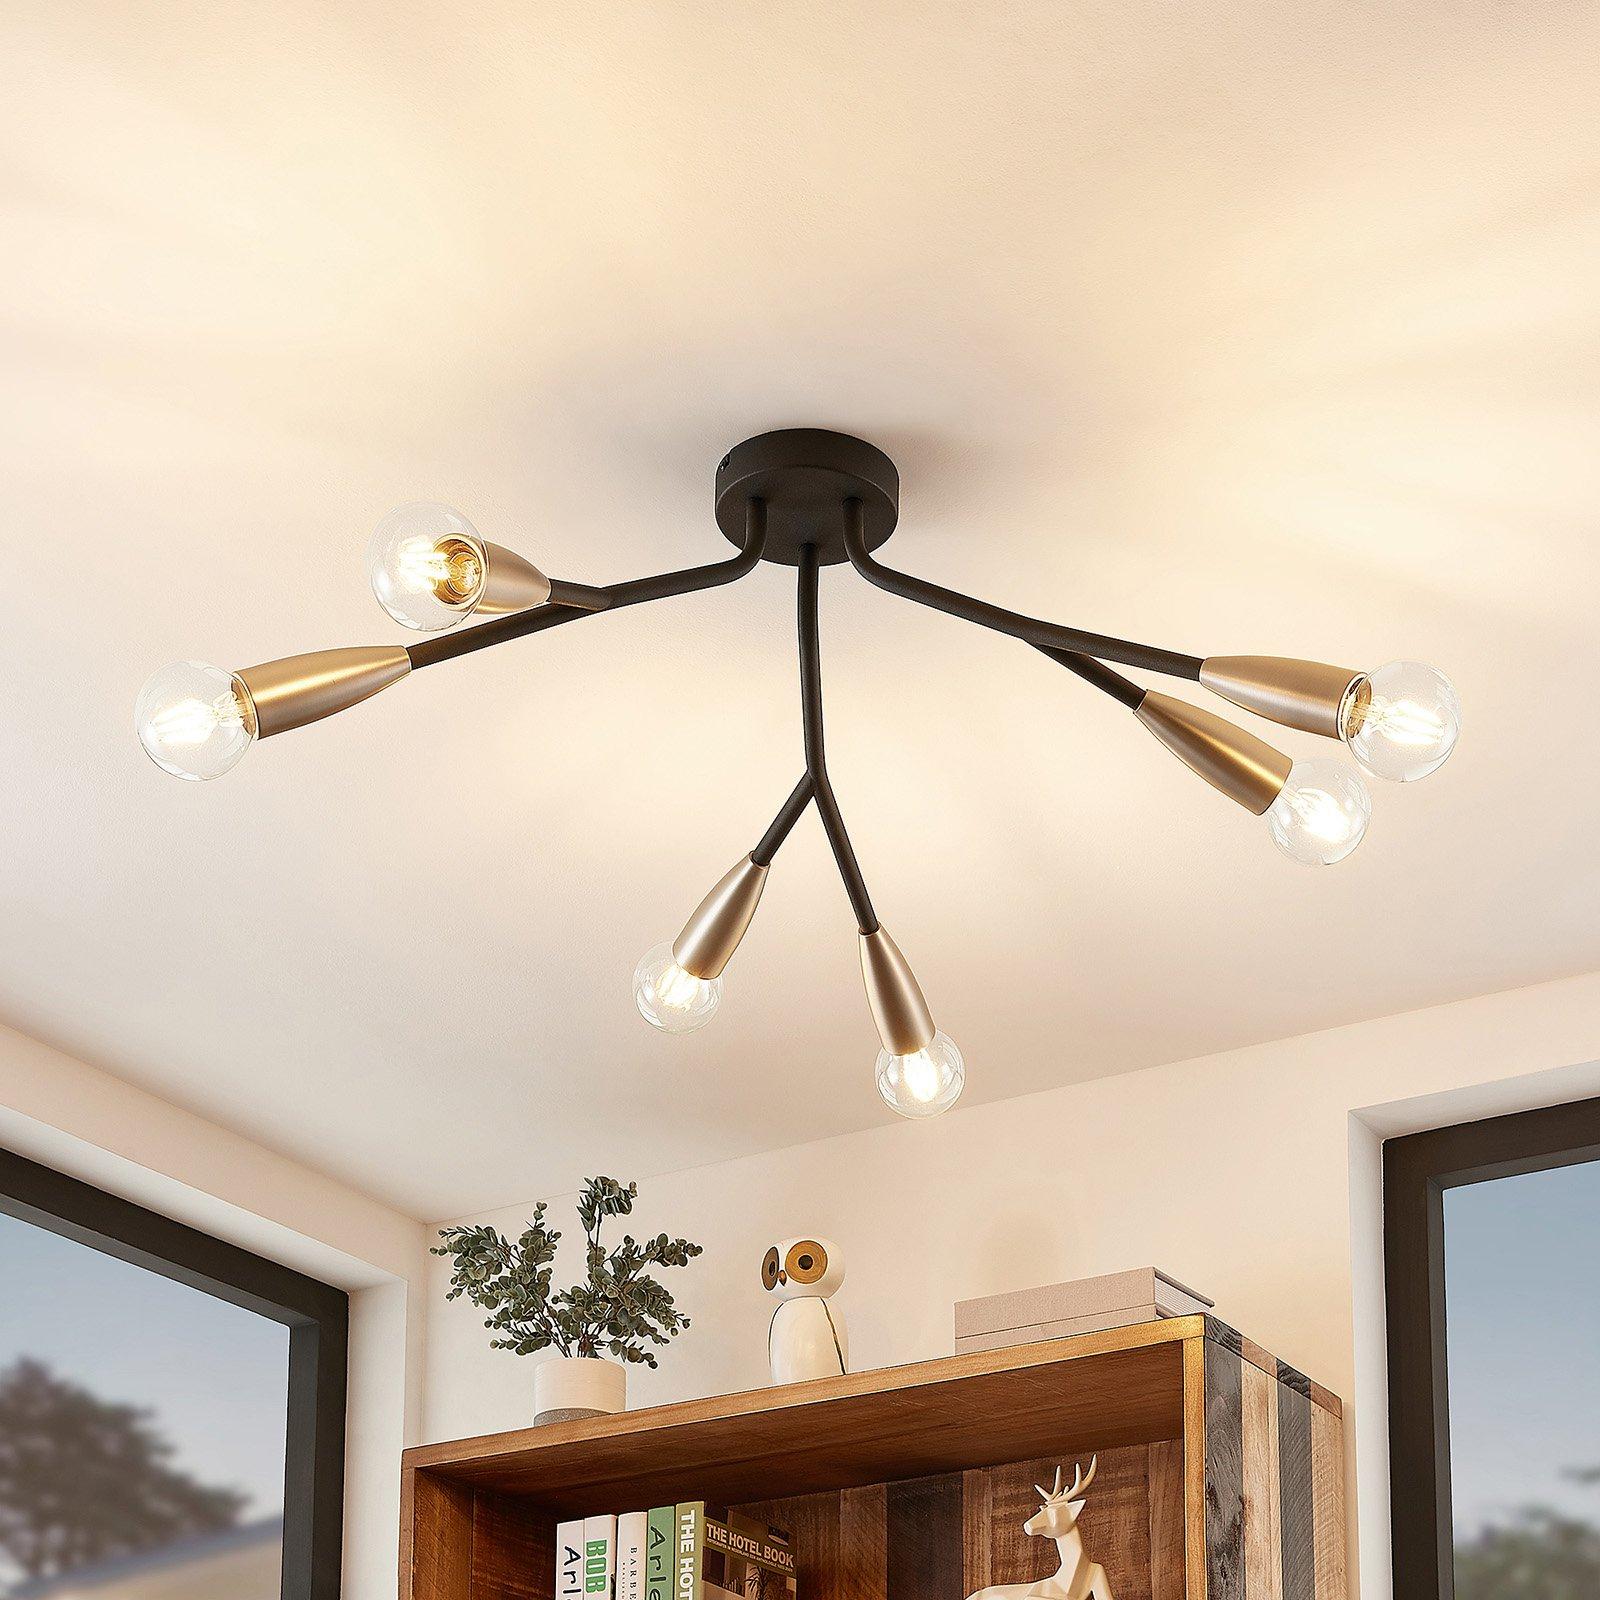 Lucande Carlea taklampe, 6 lyskilder, svart nikkel